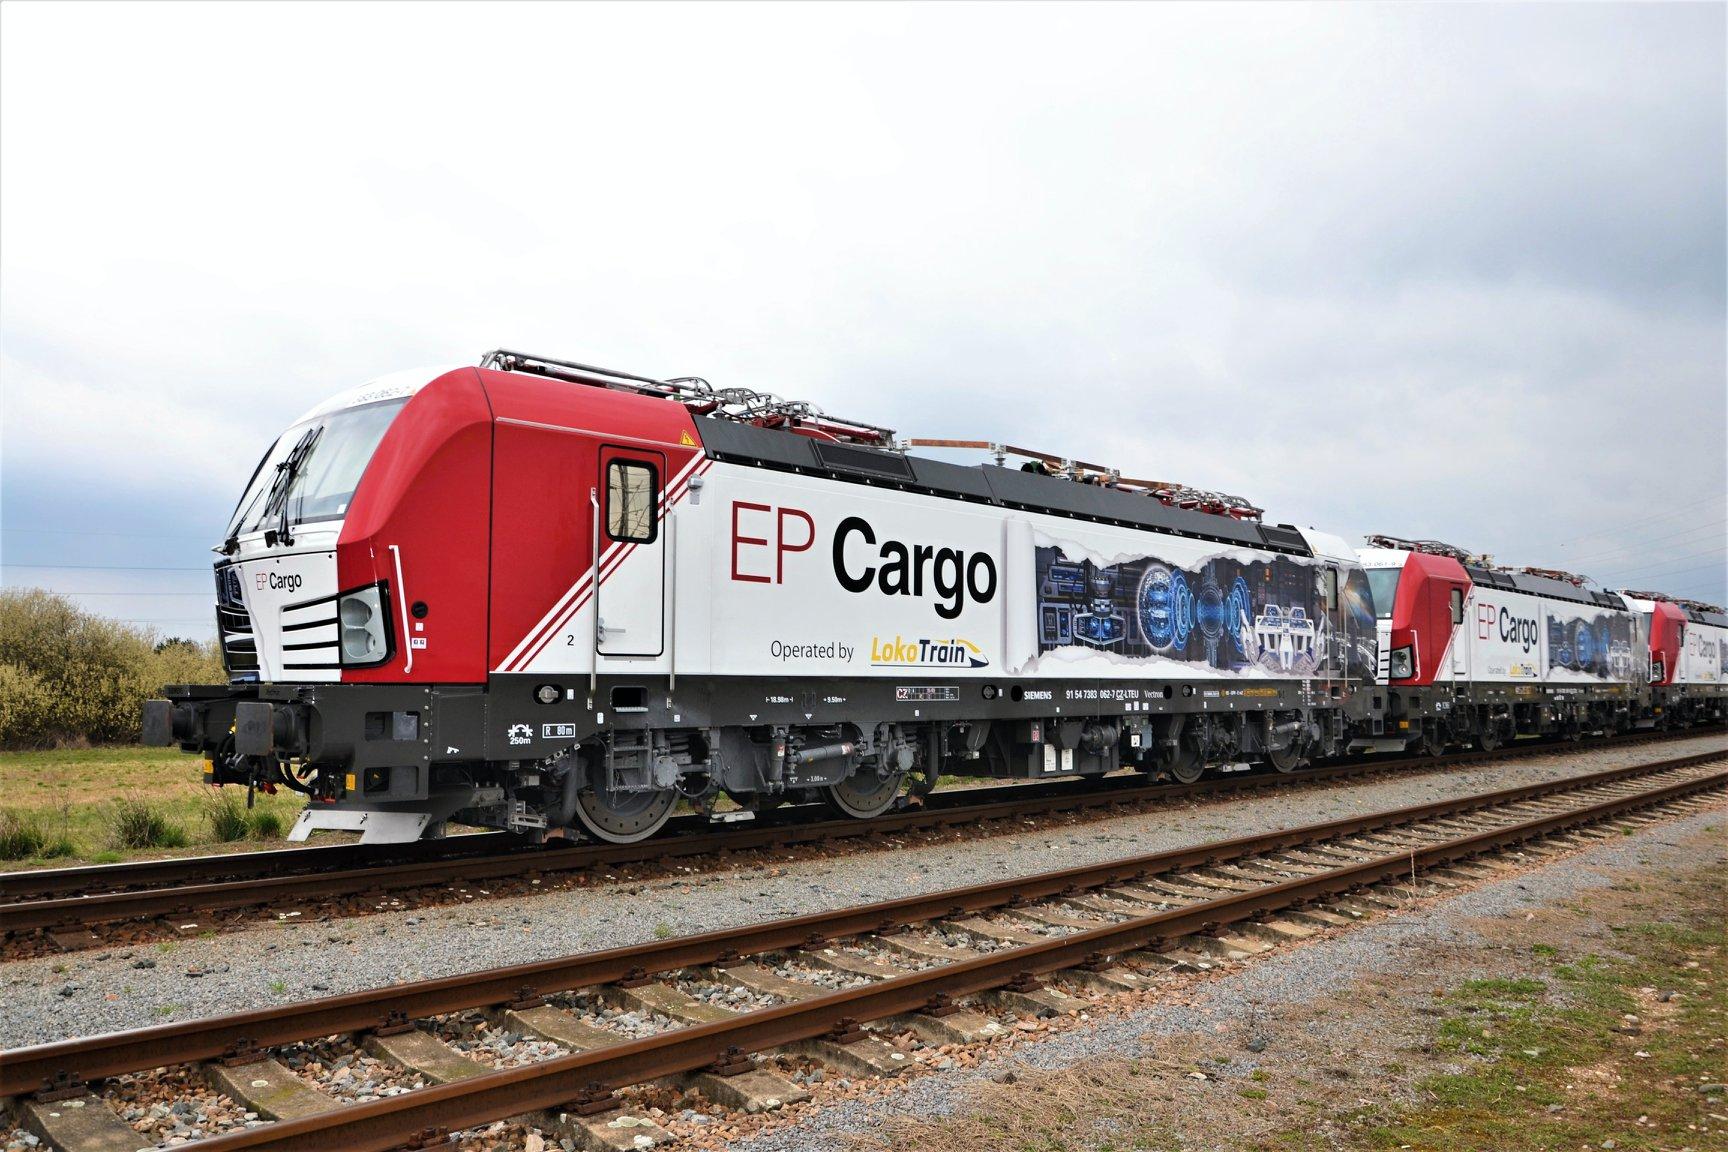 Siemens Vectron společnosti EP Cargo. Foto: EP Cargo